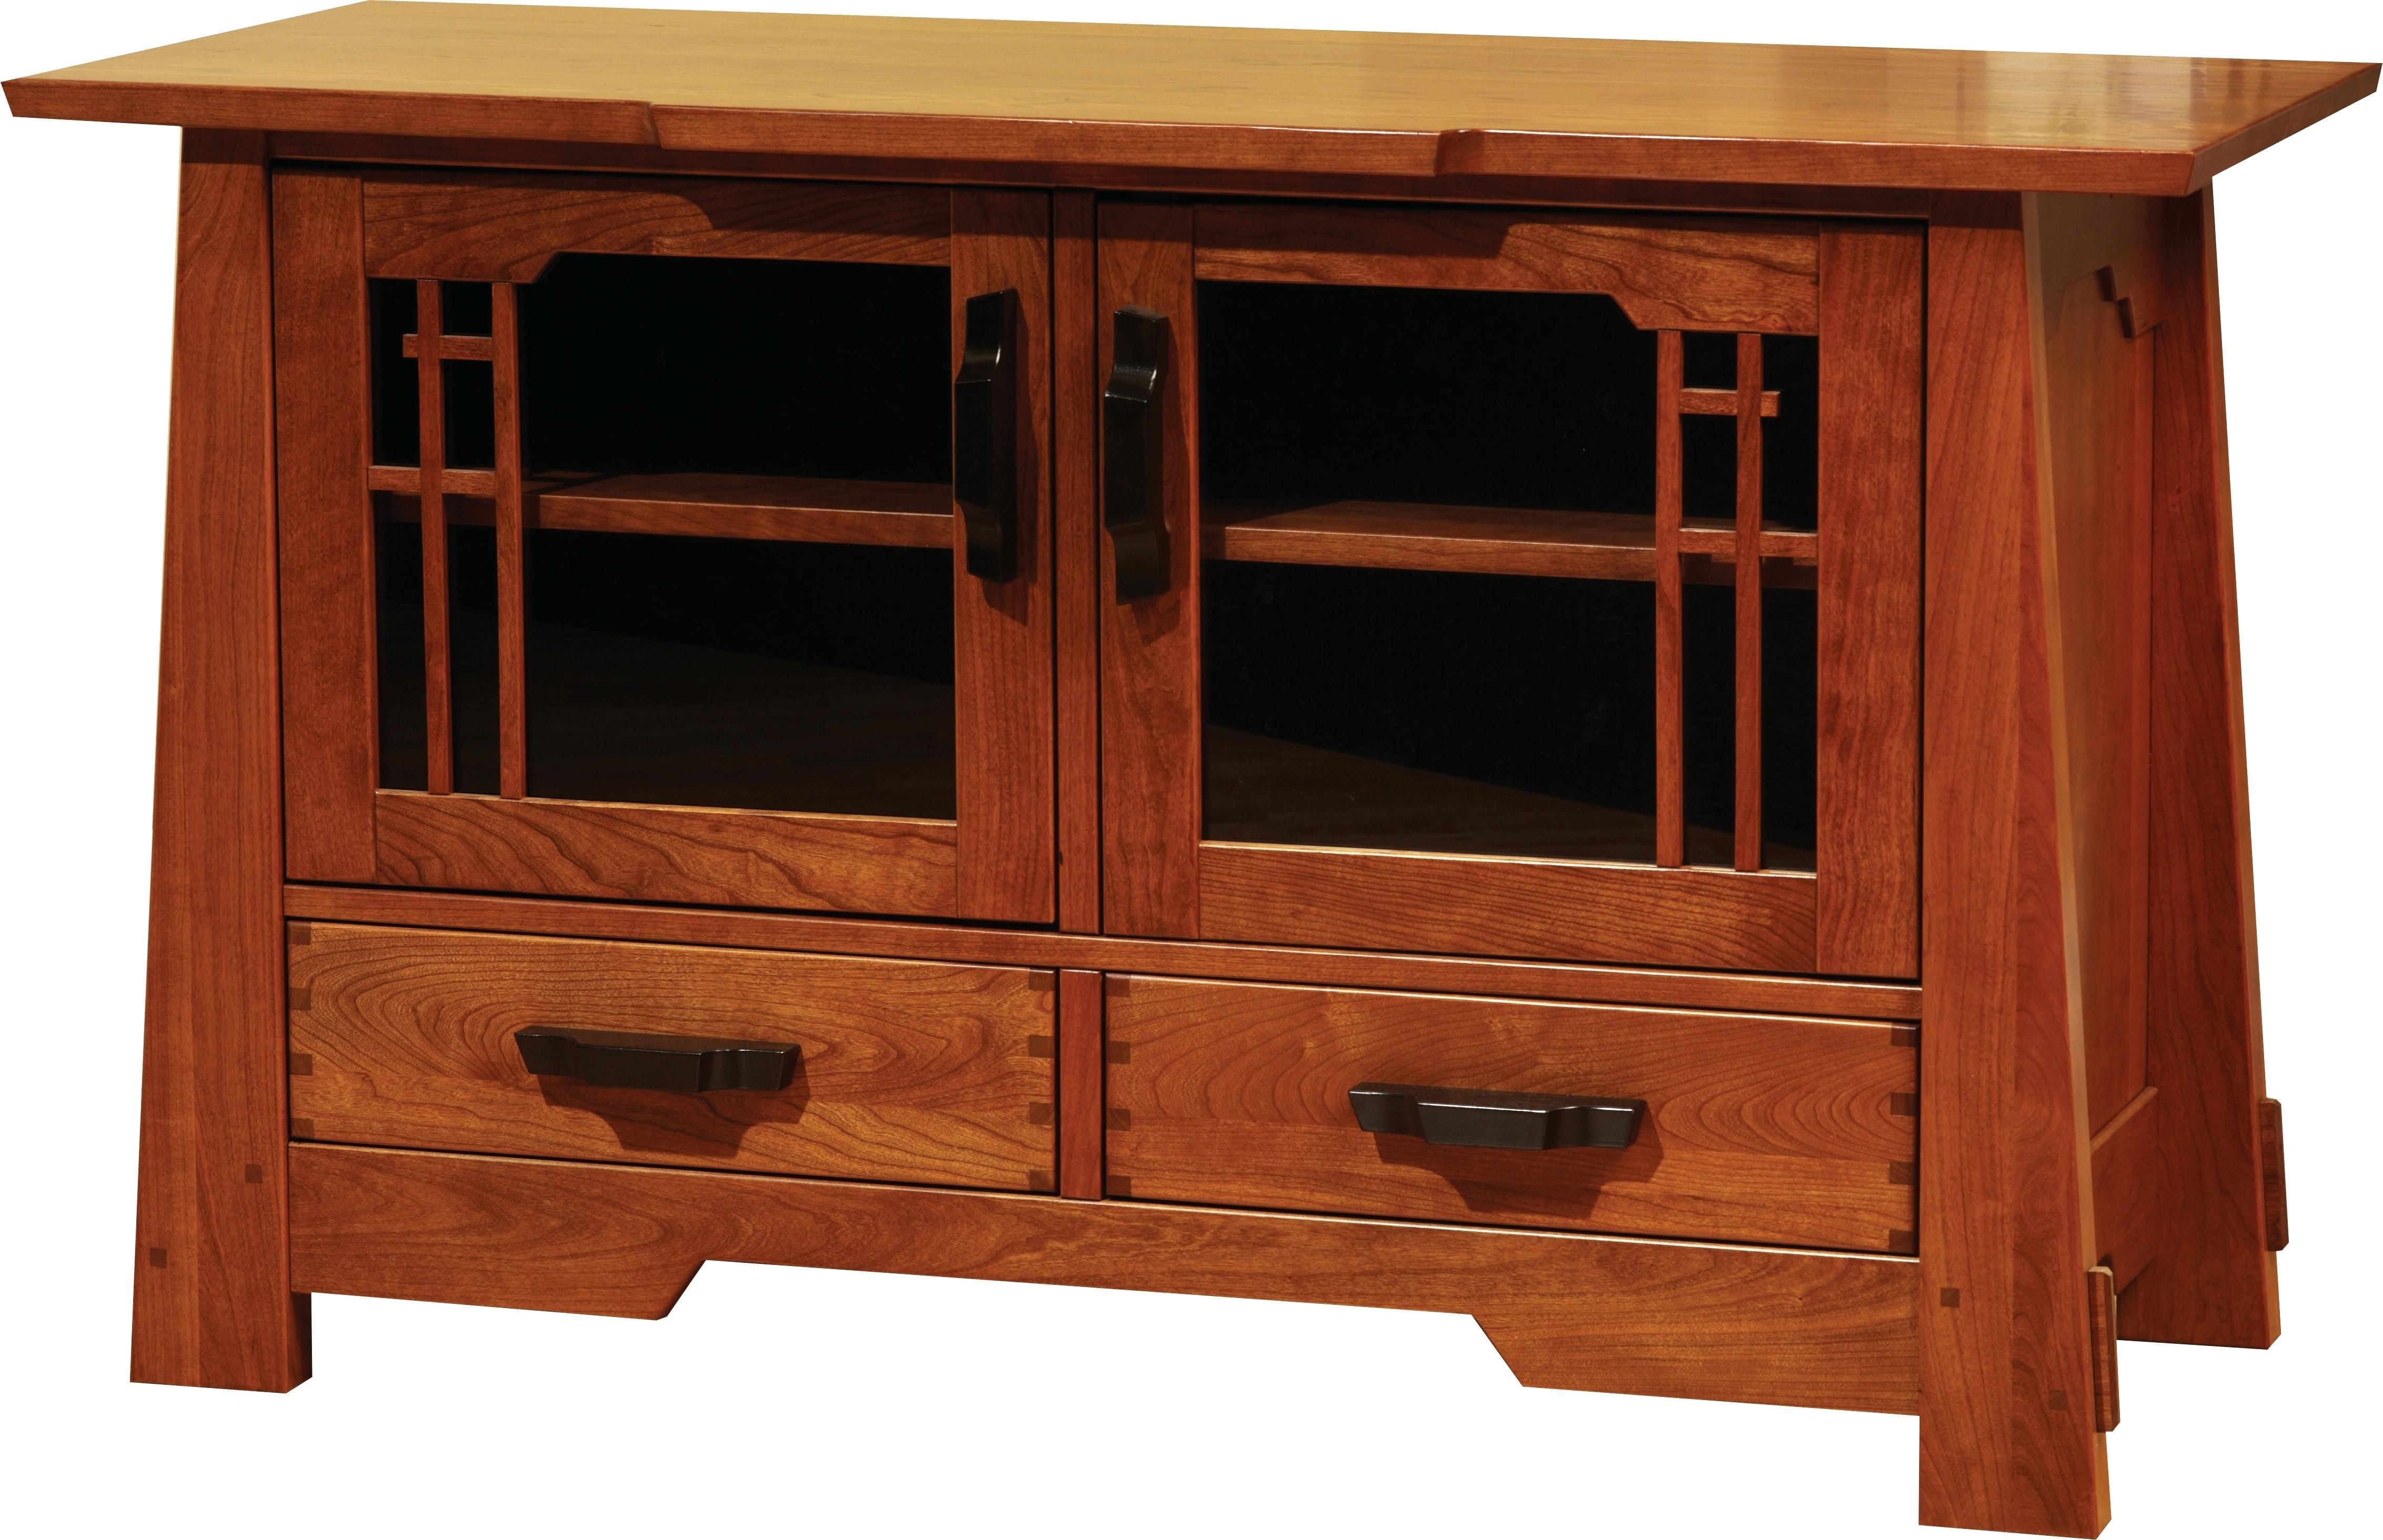 Tv Stand Craftsman Style Tv Stand Craftsman Style Tv Cabinet Amish Furniture Tv Stand Furniture